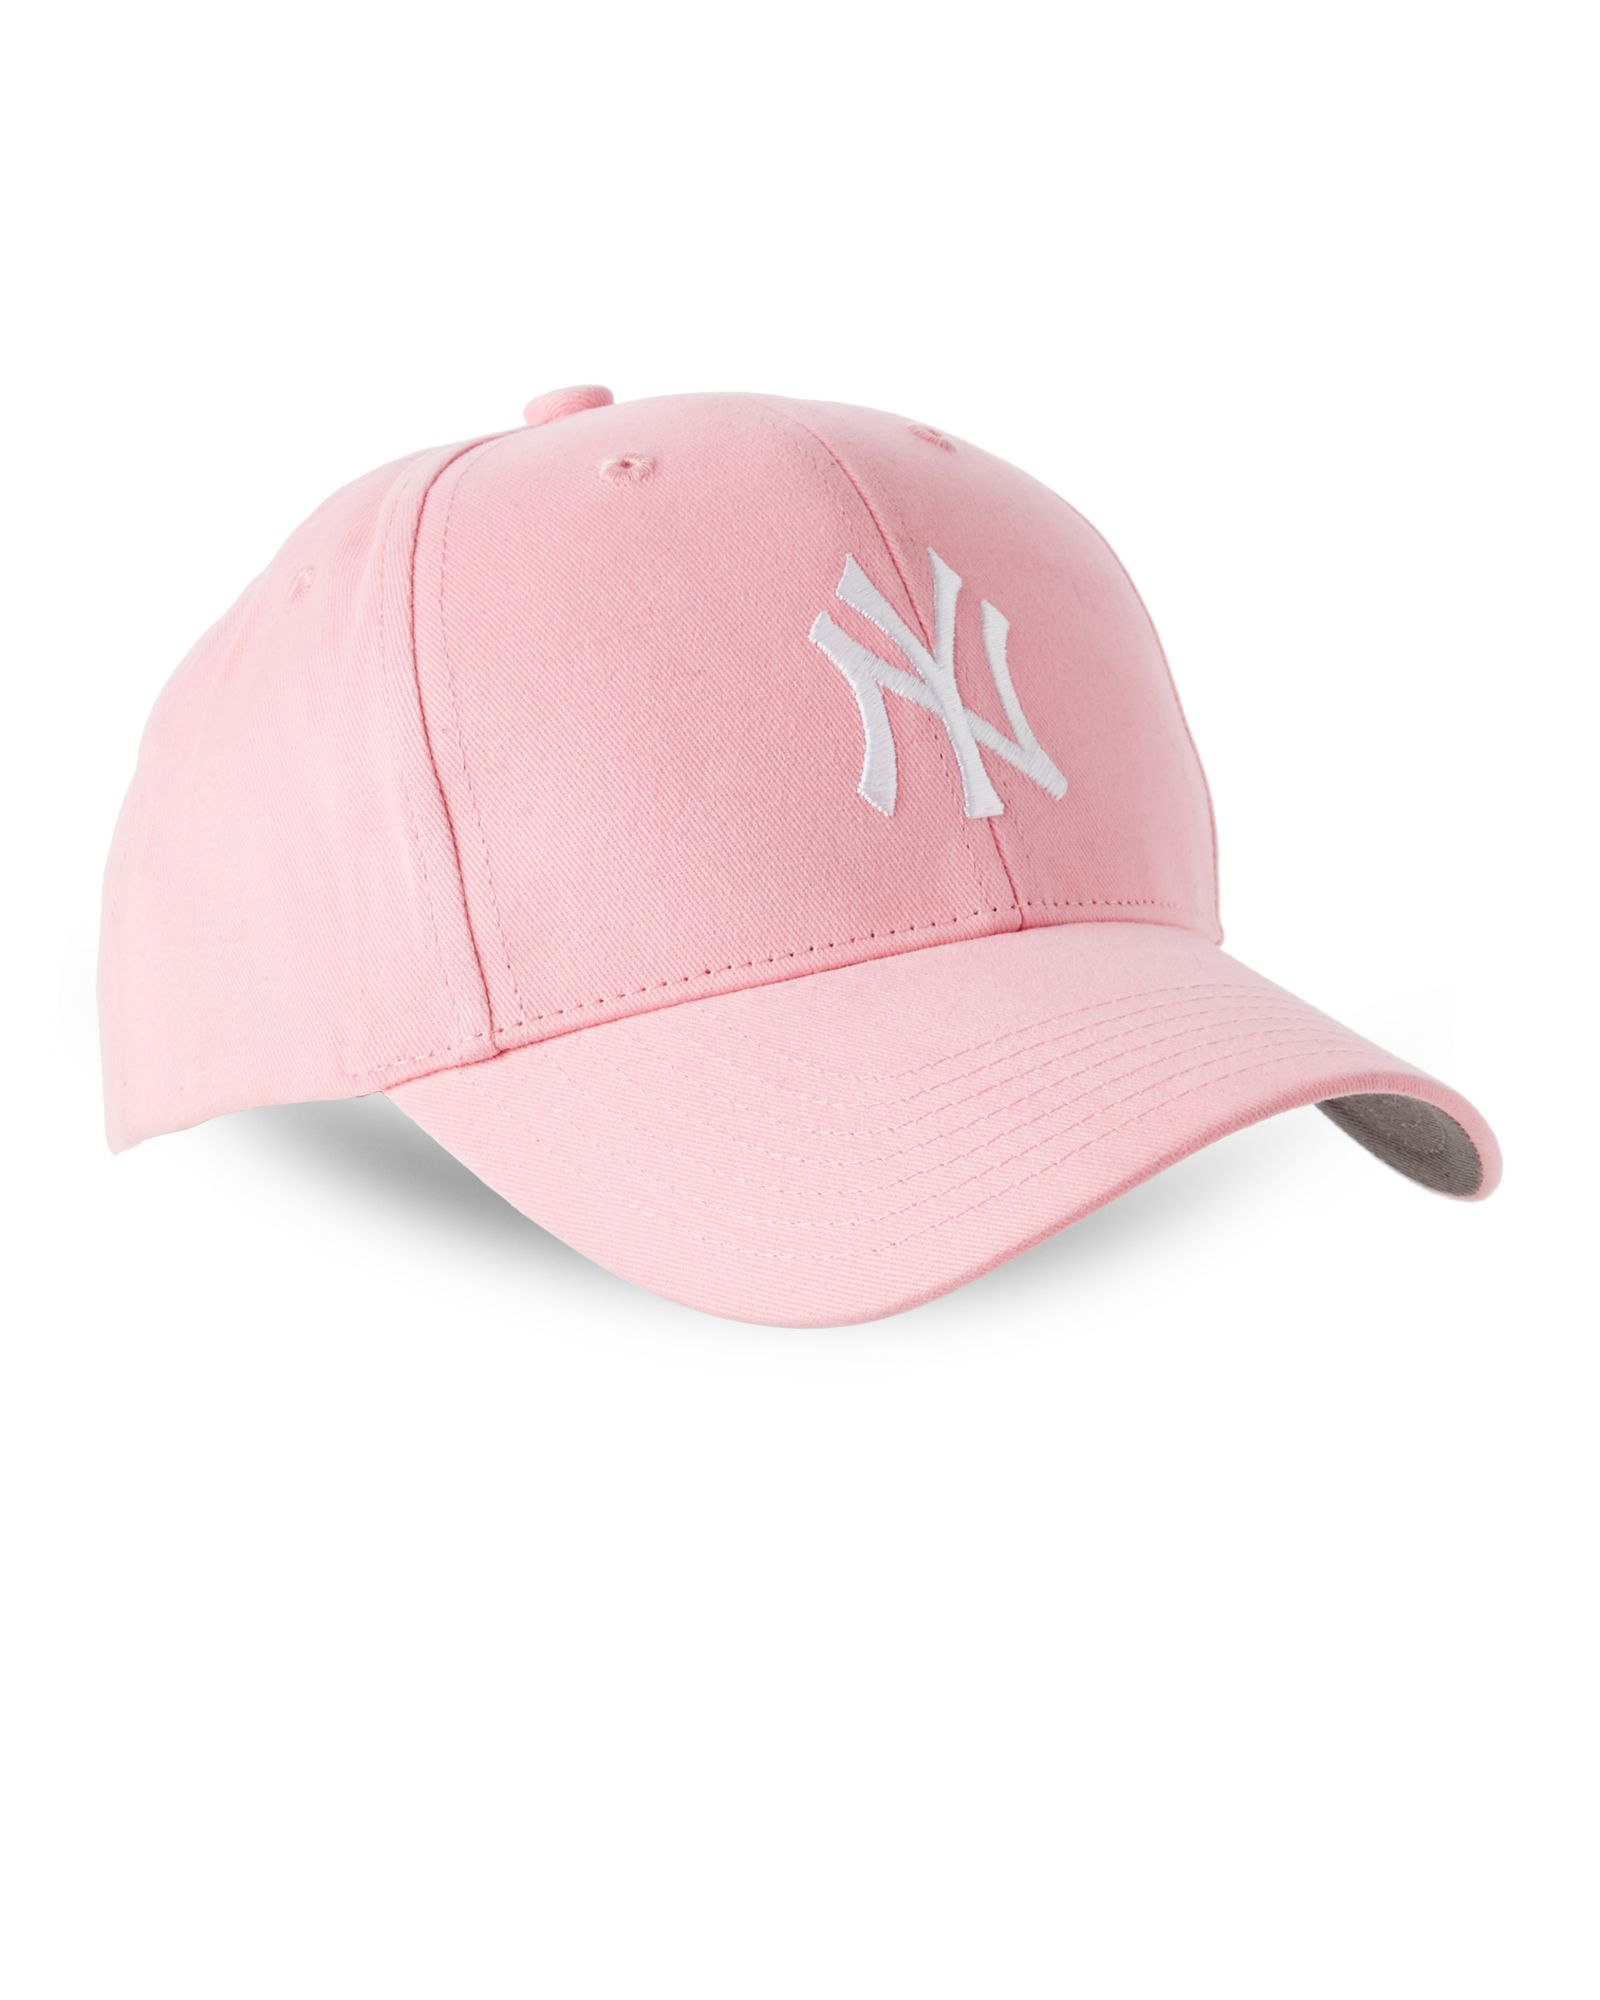 55f56415a8a 47 Brand (Kids Girls) Adjustable Yankees Cap